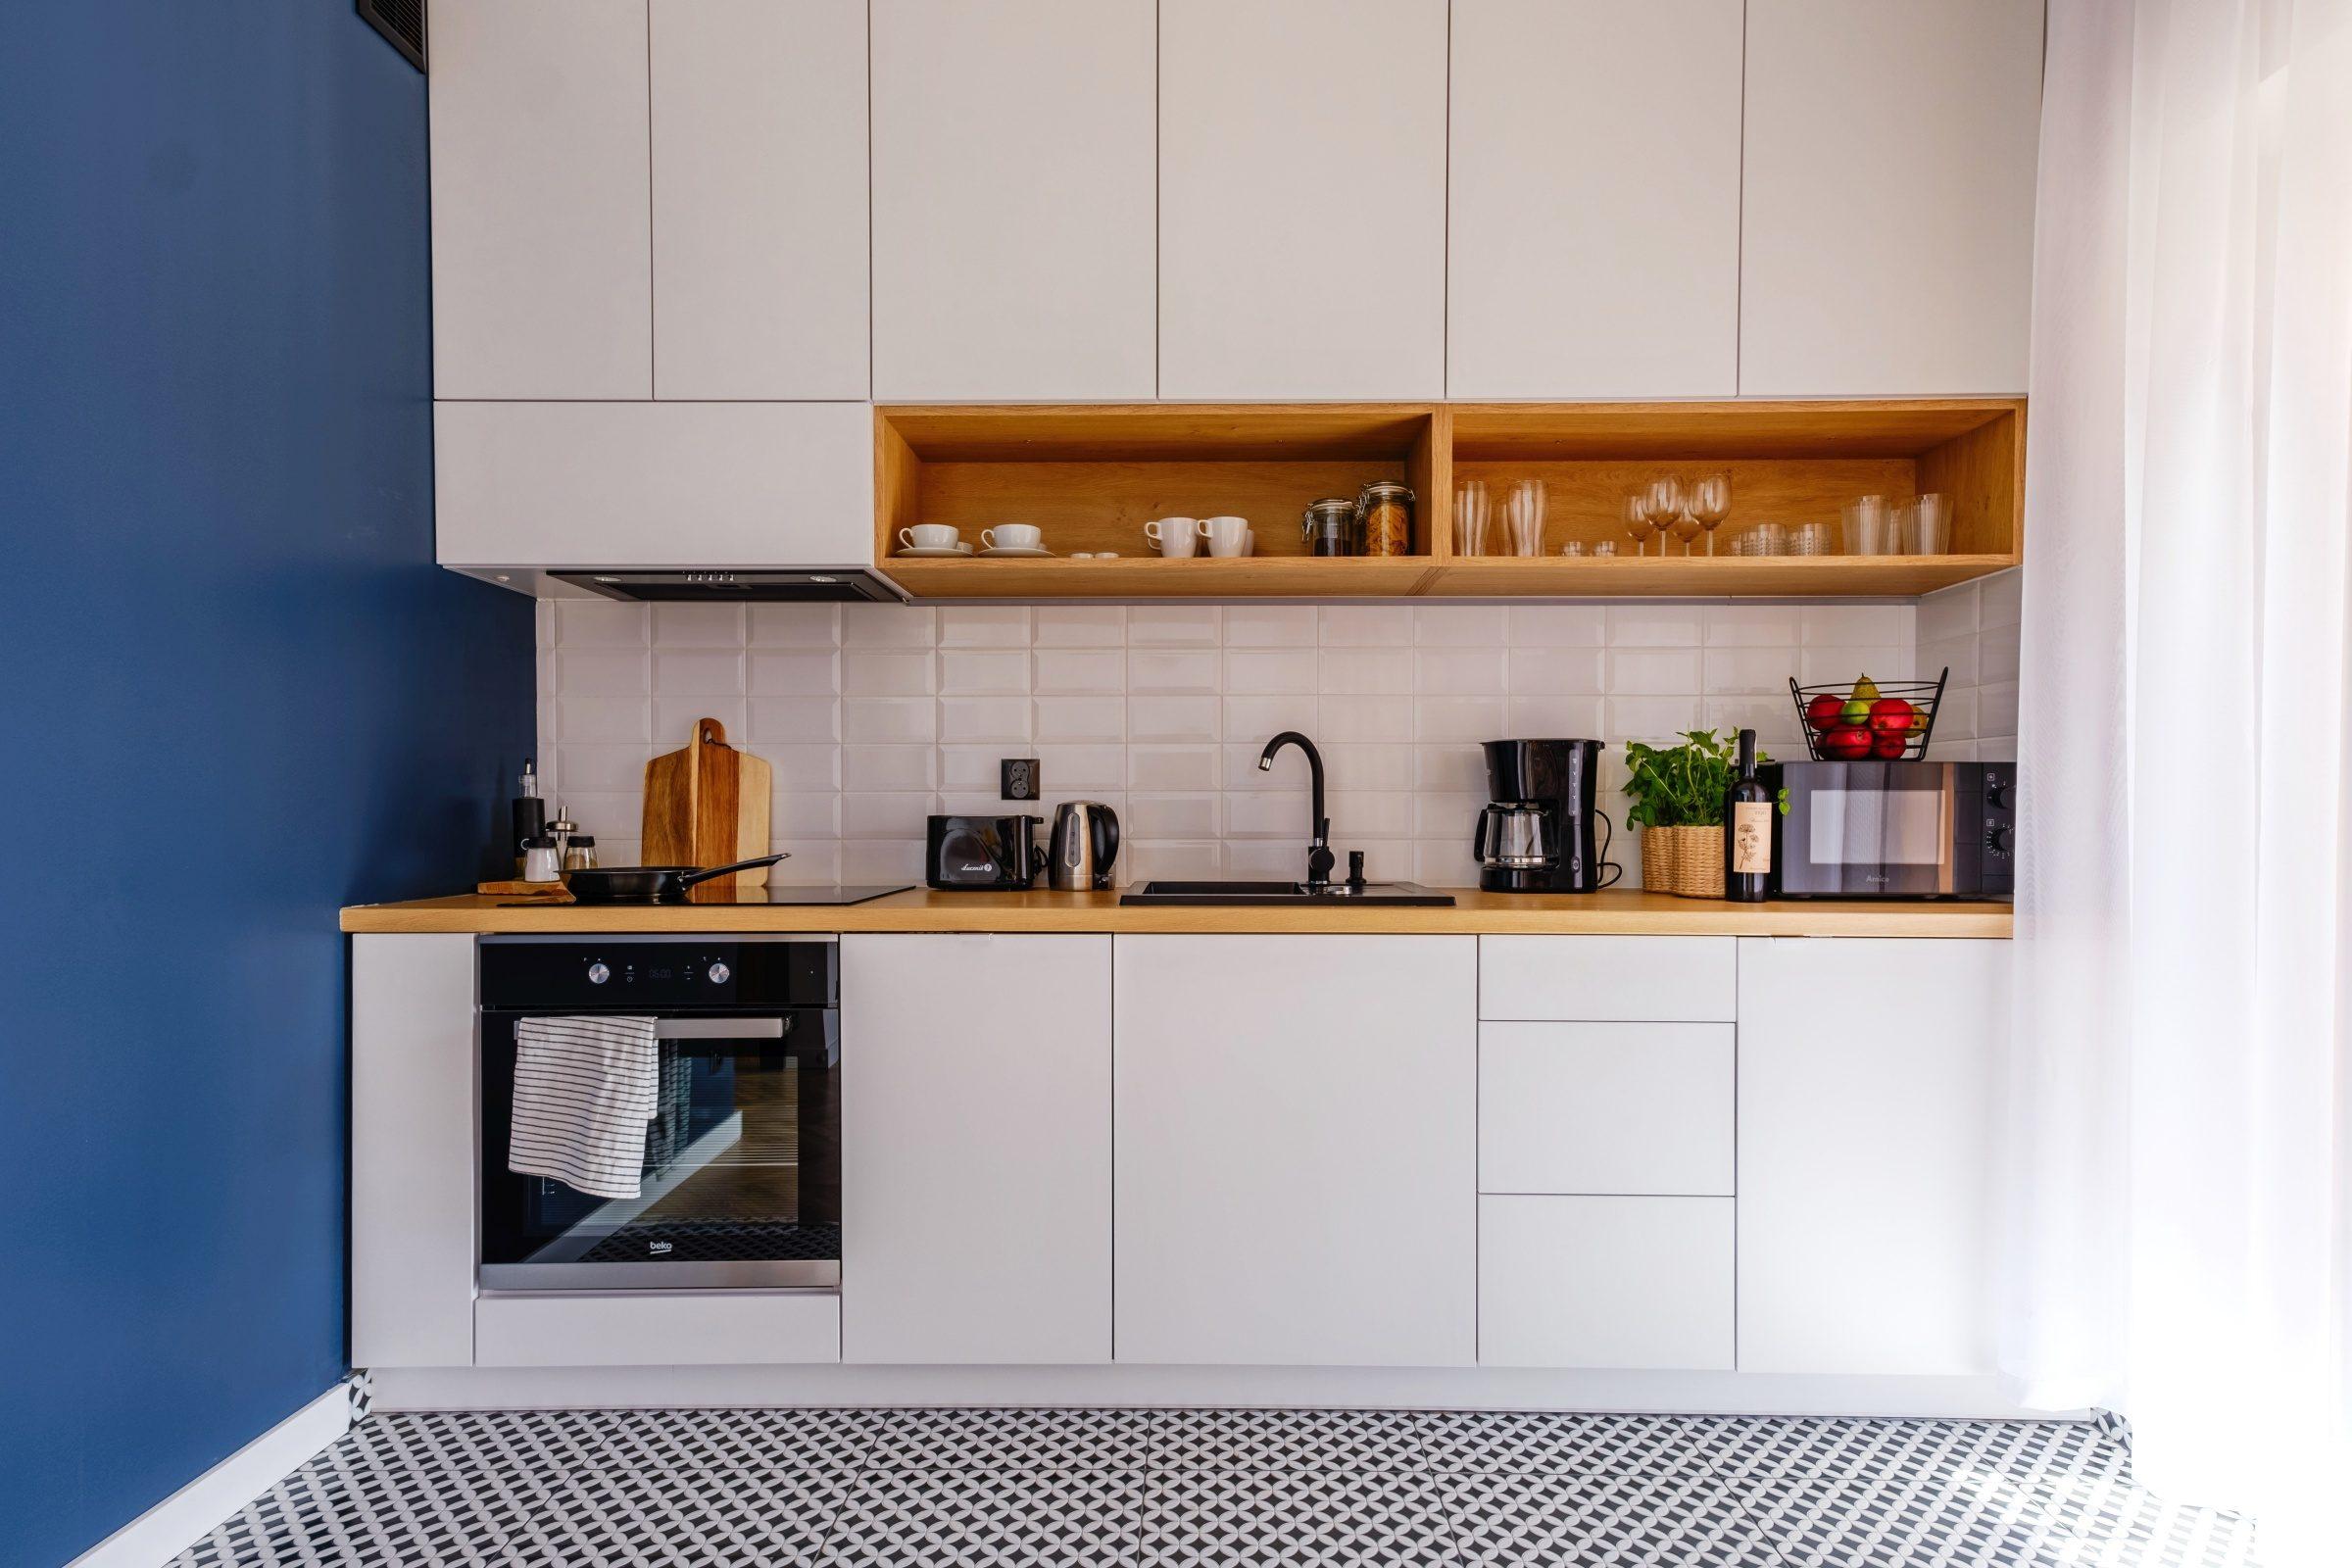 Apartamenty NOVA BIAŁKA Białka Tatrzańska apartament 6 aneks kuchenny